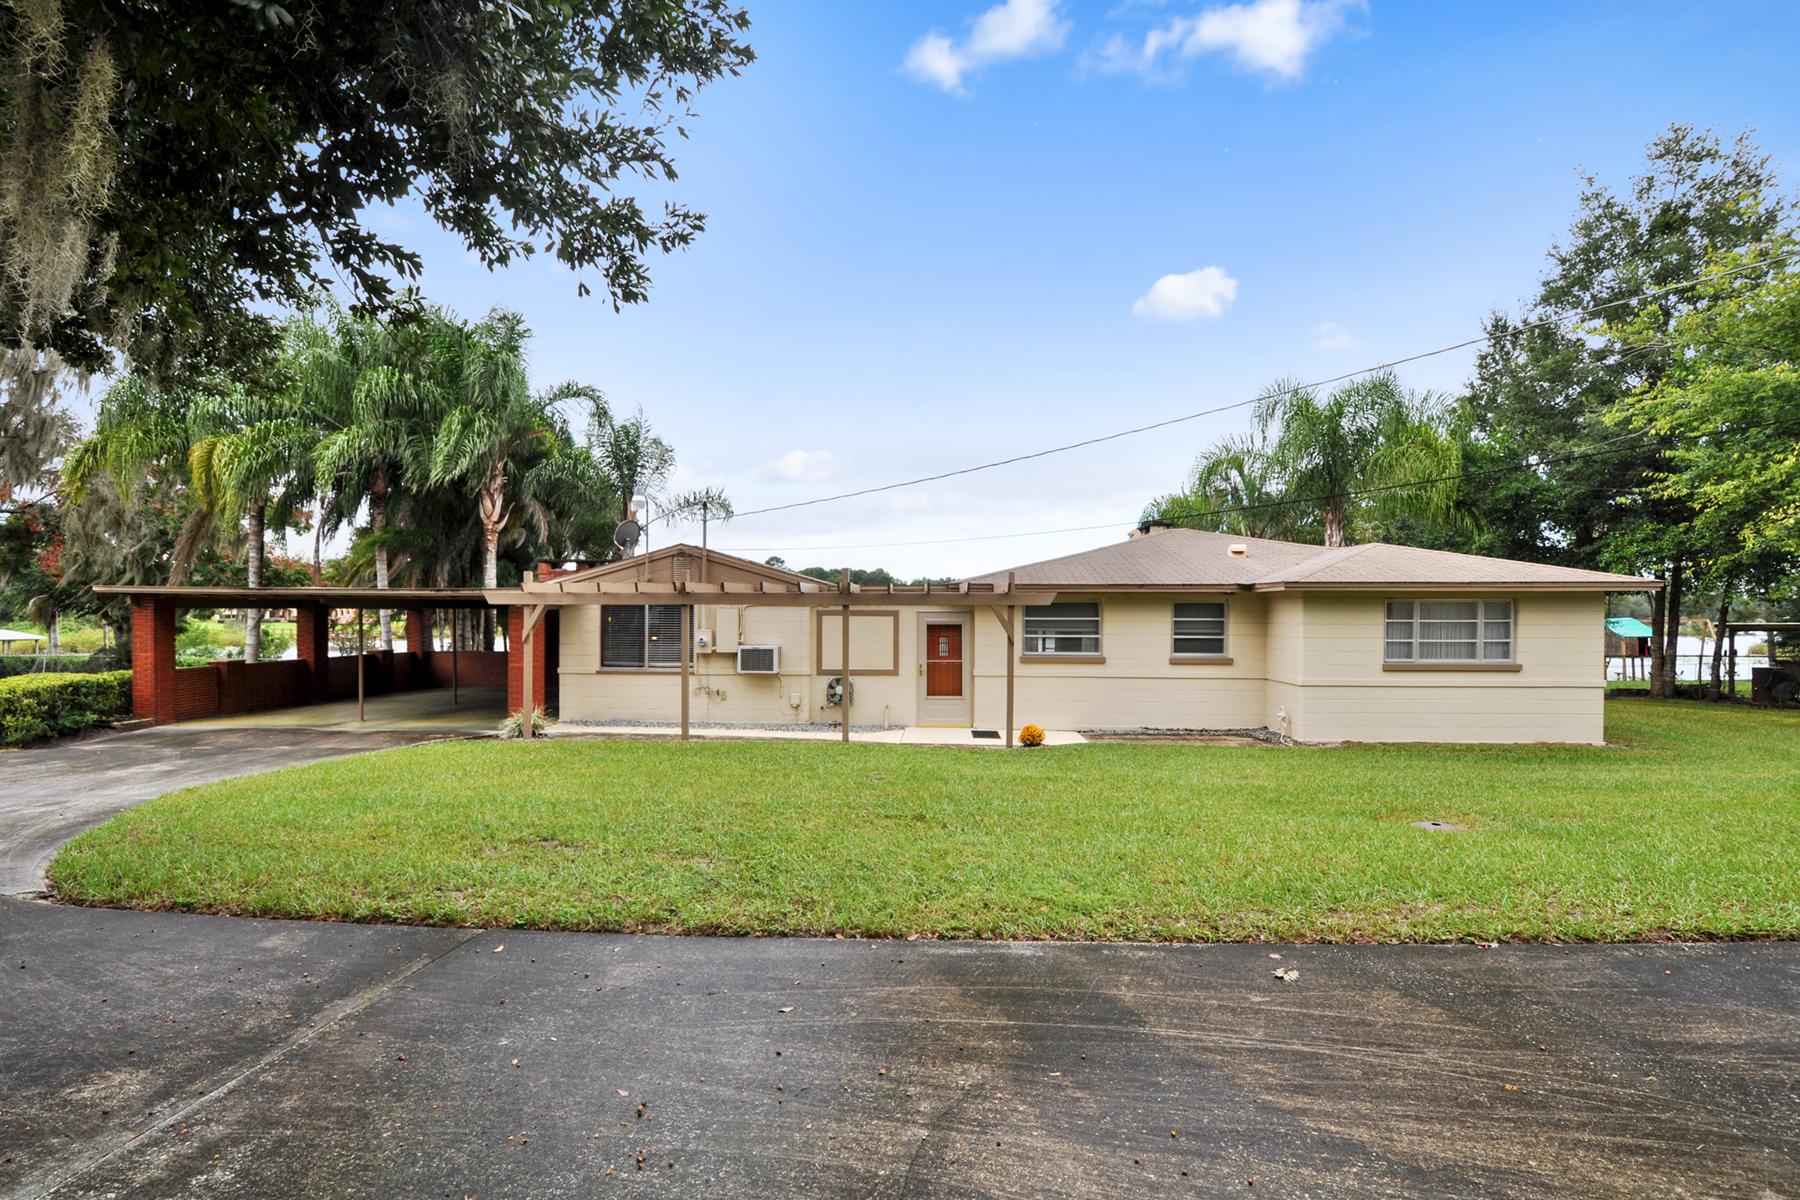 Single Family Home for Sale at Sanford, Florida 1900 Lake Markham Road Sanford, Florida 32771 United States